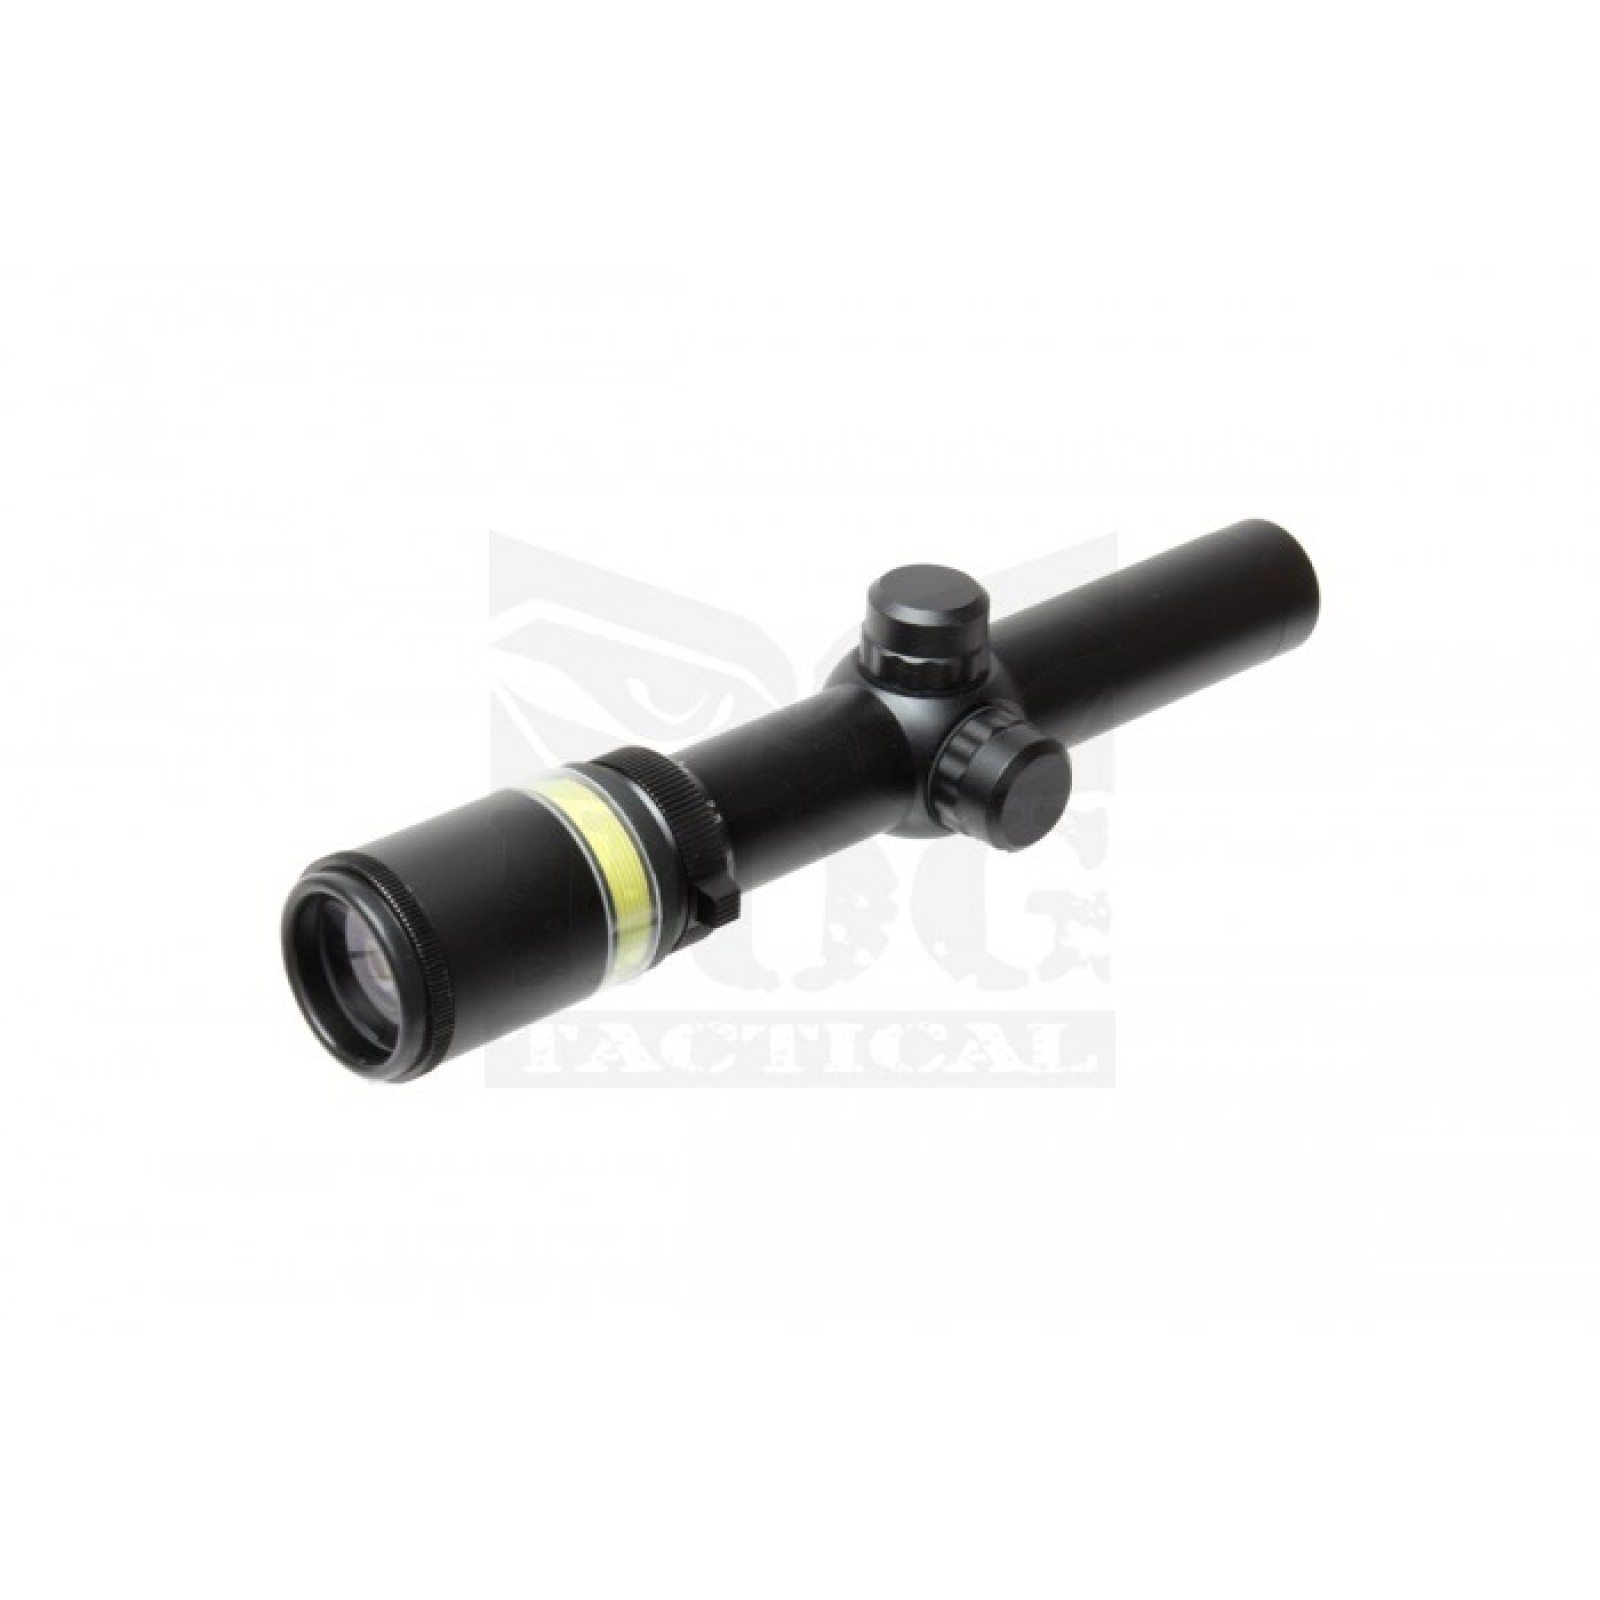 1.5-6x24 Fiber Optic Scope Green Triangle illuminated Telescopic Rifle Scope HOT